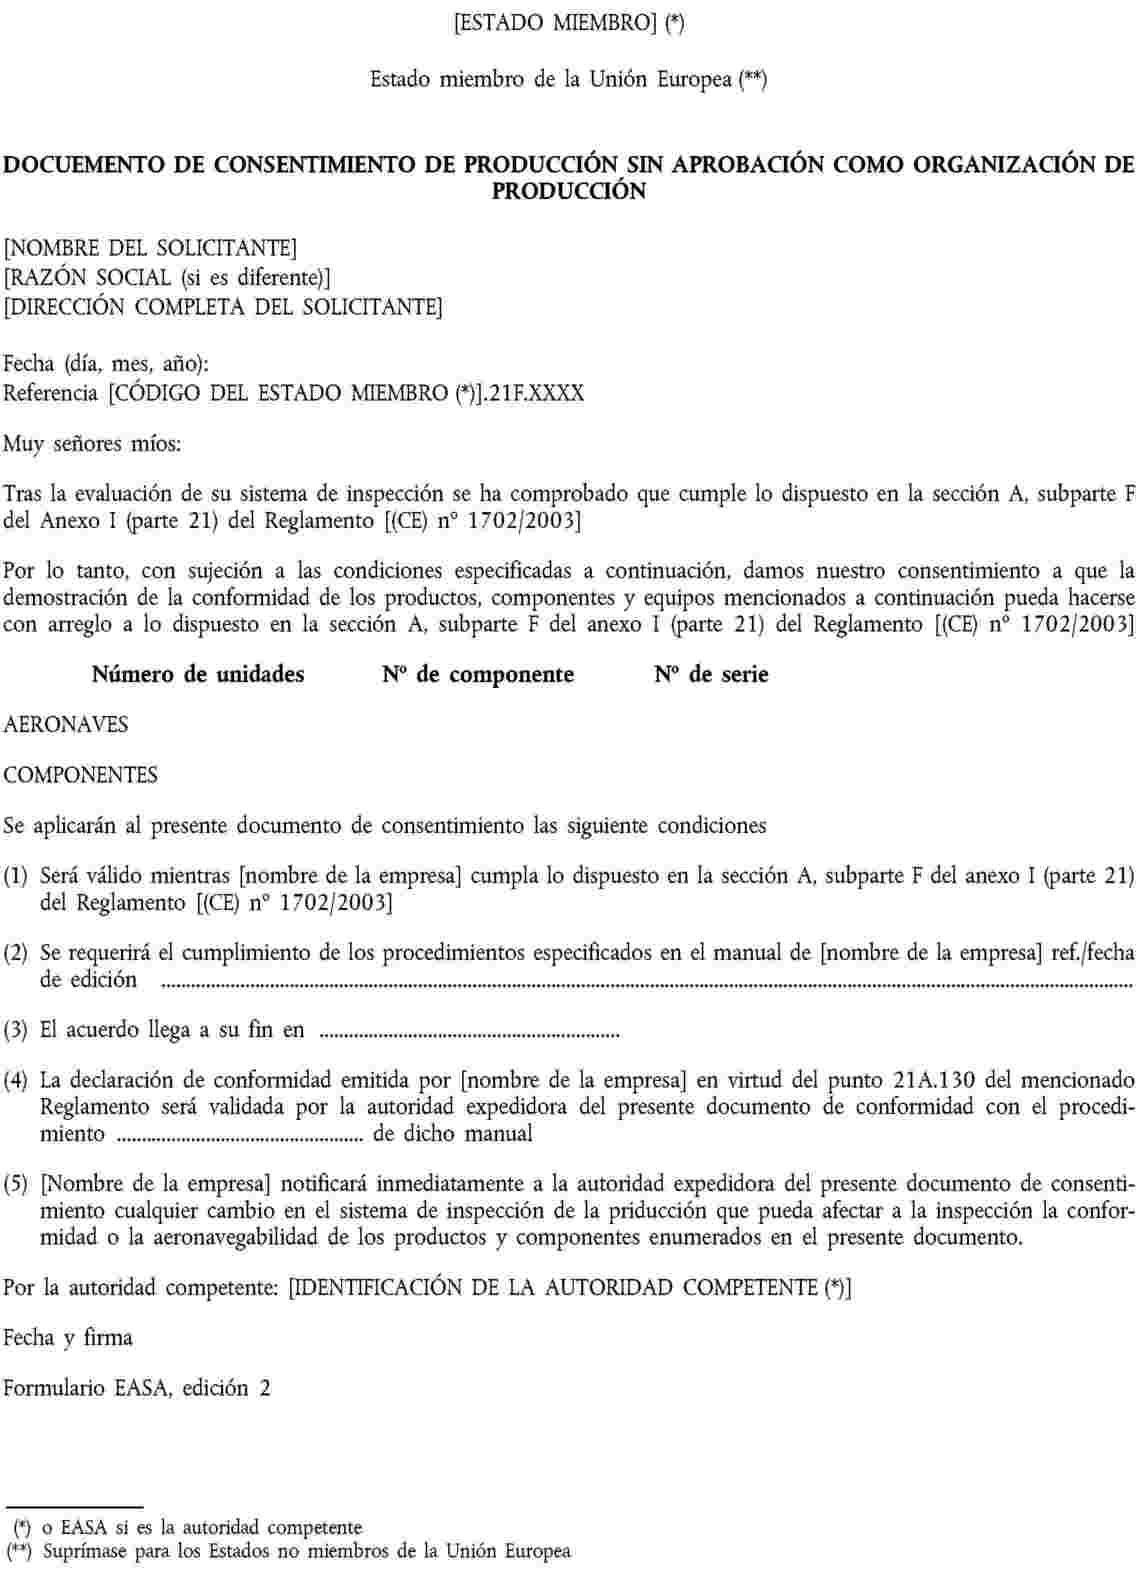 EUR-Lex - 32012R0748 - EN - EUR-Lex